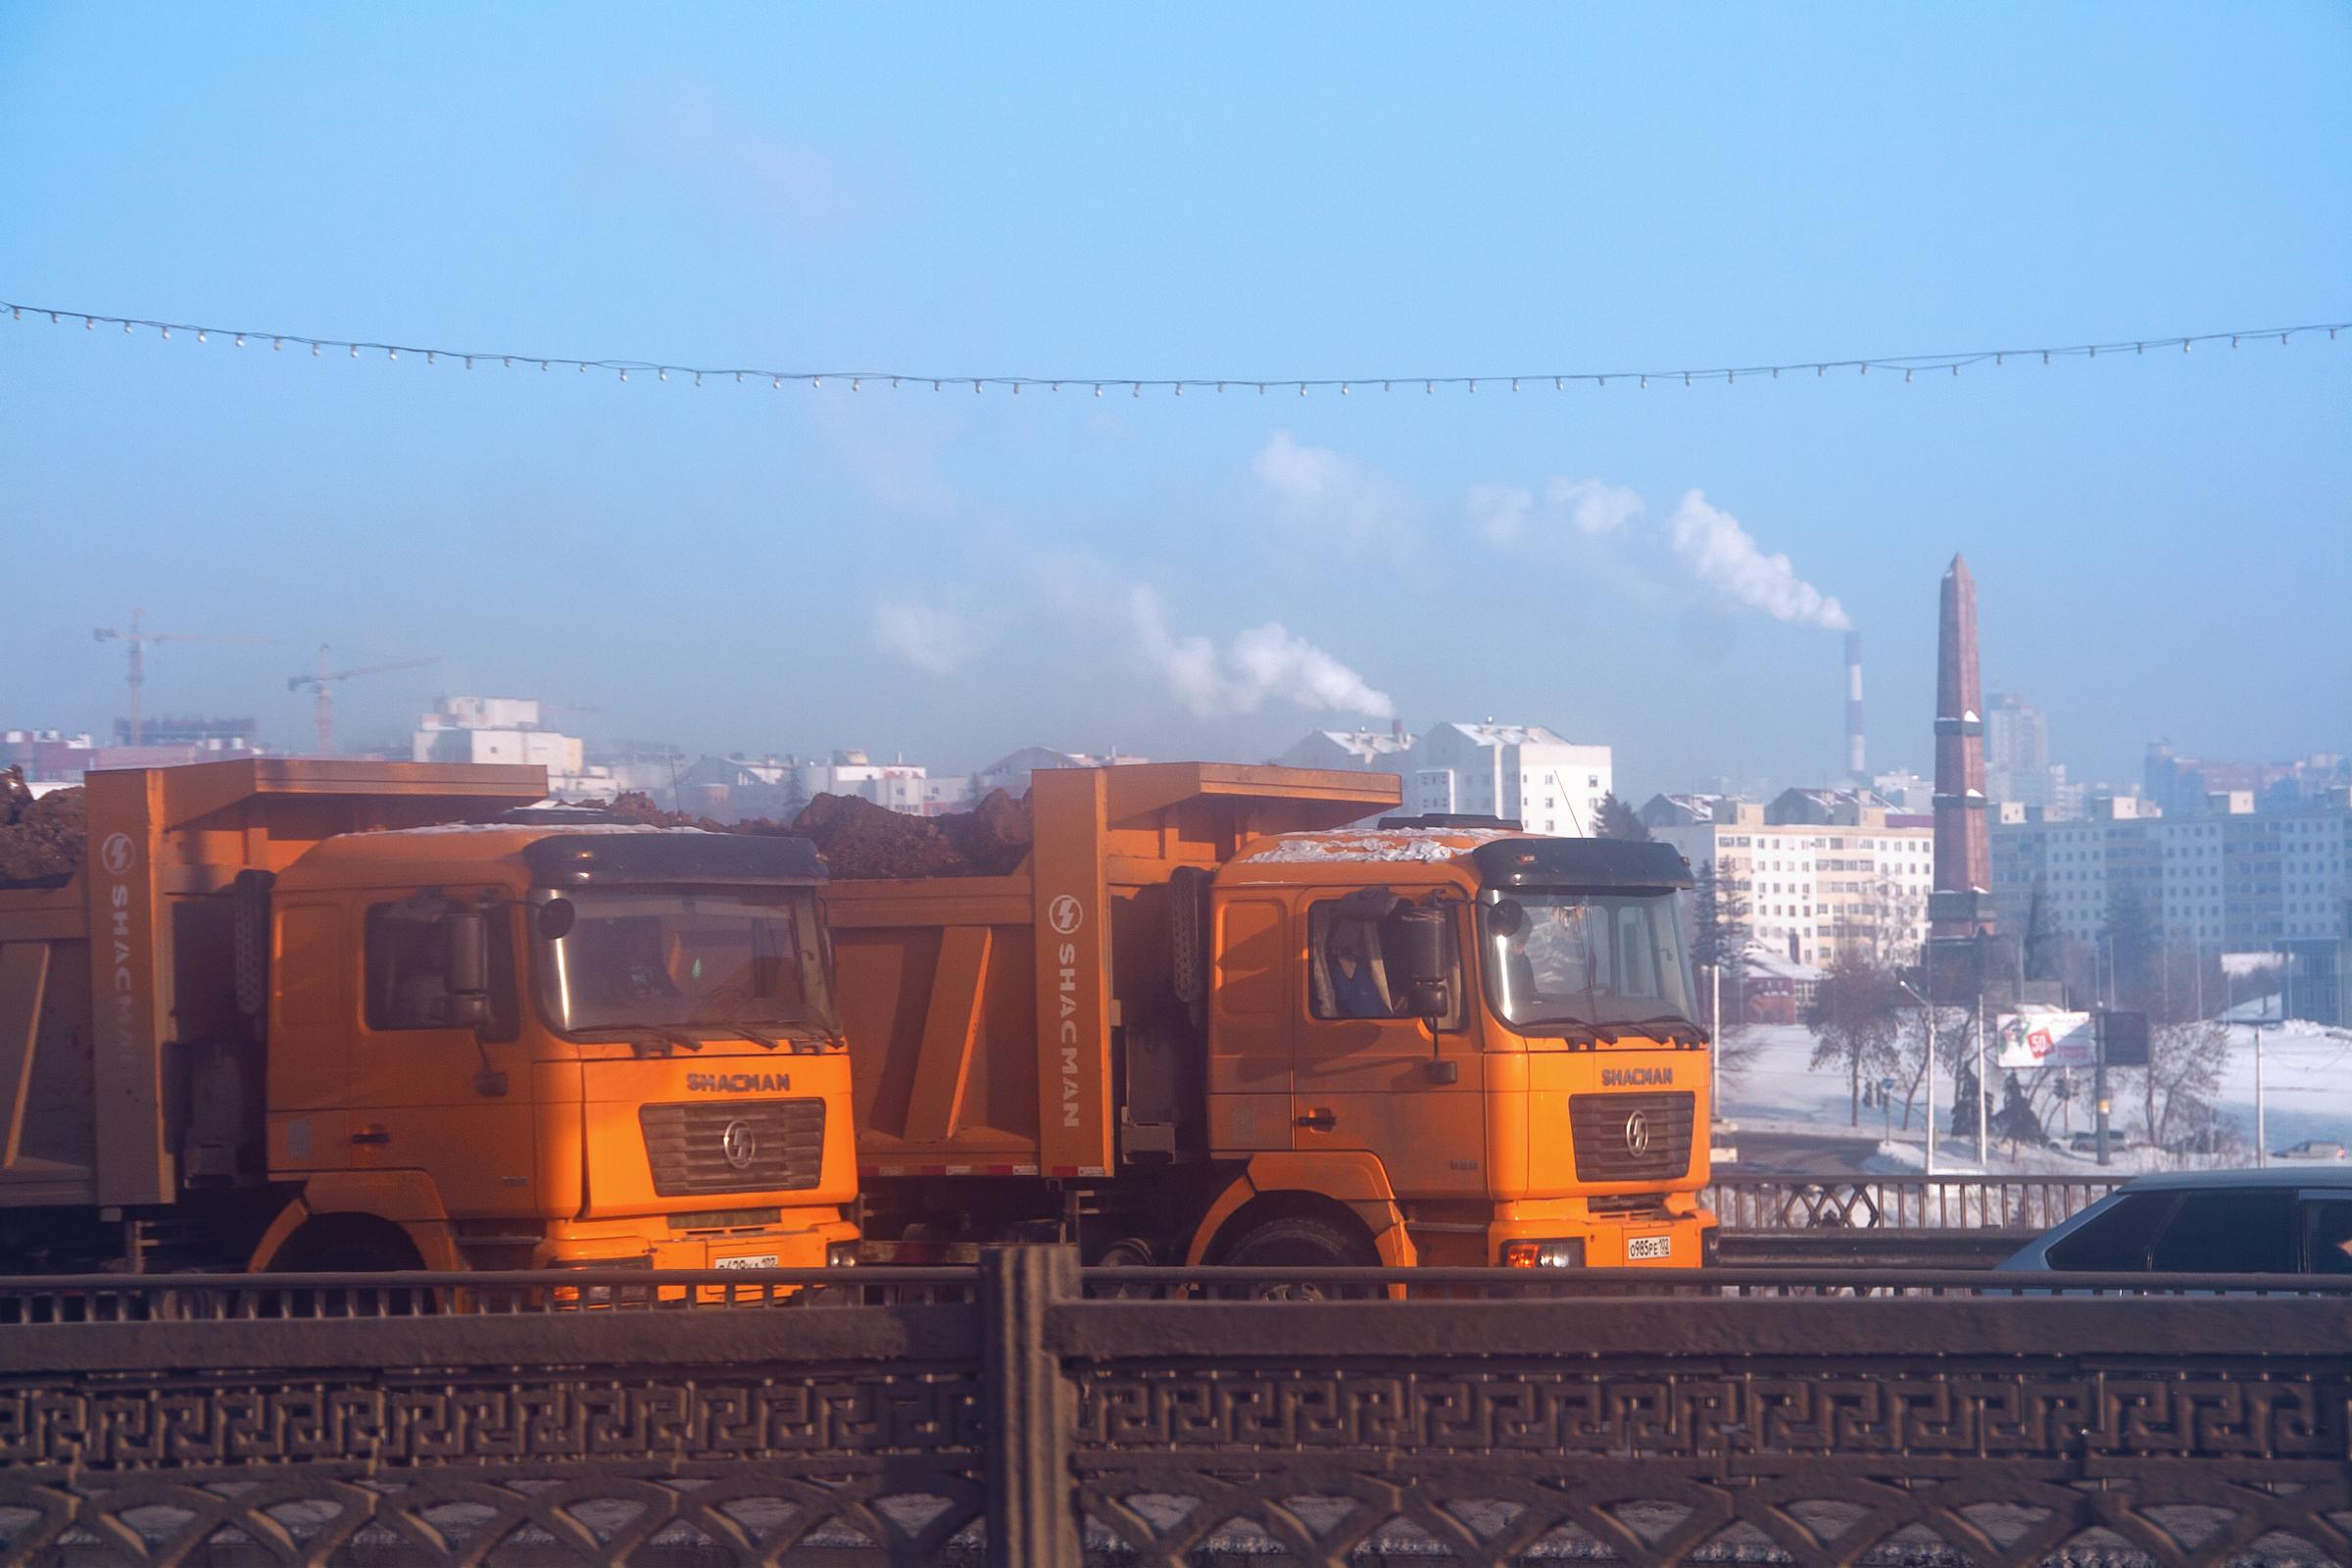 Trucks, Asphalt, Traffic, Vehicle, Ufa, HQ Photo